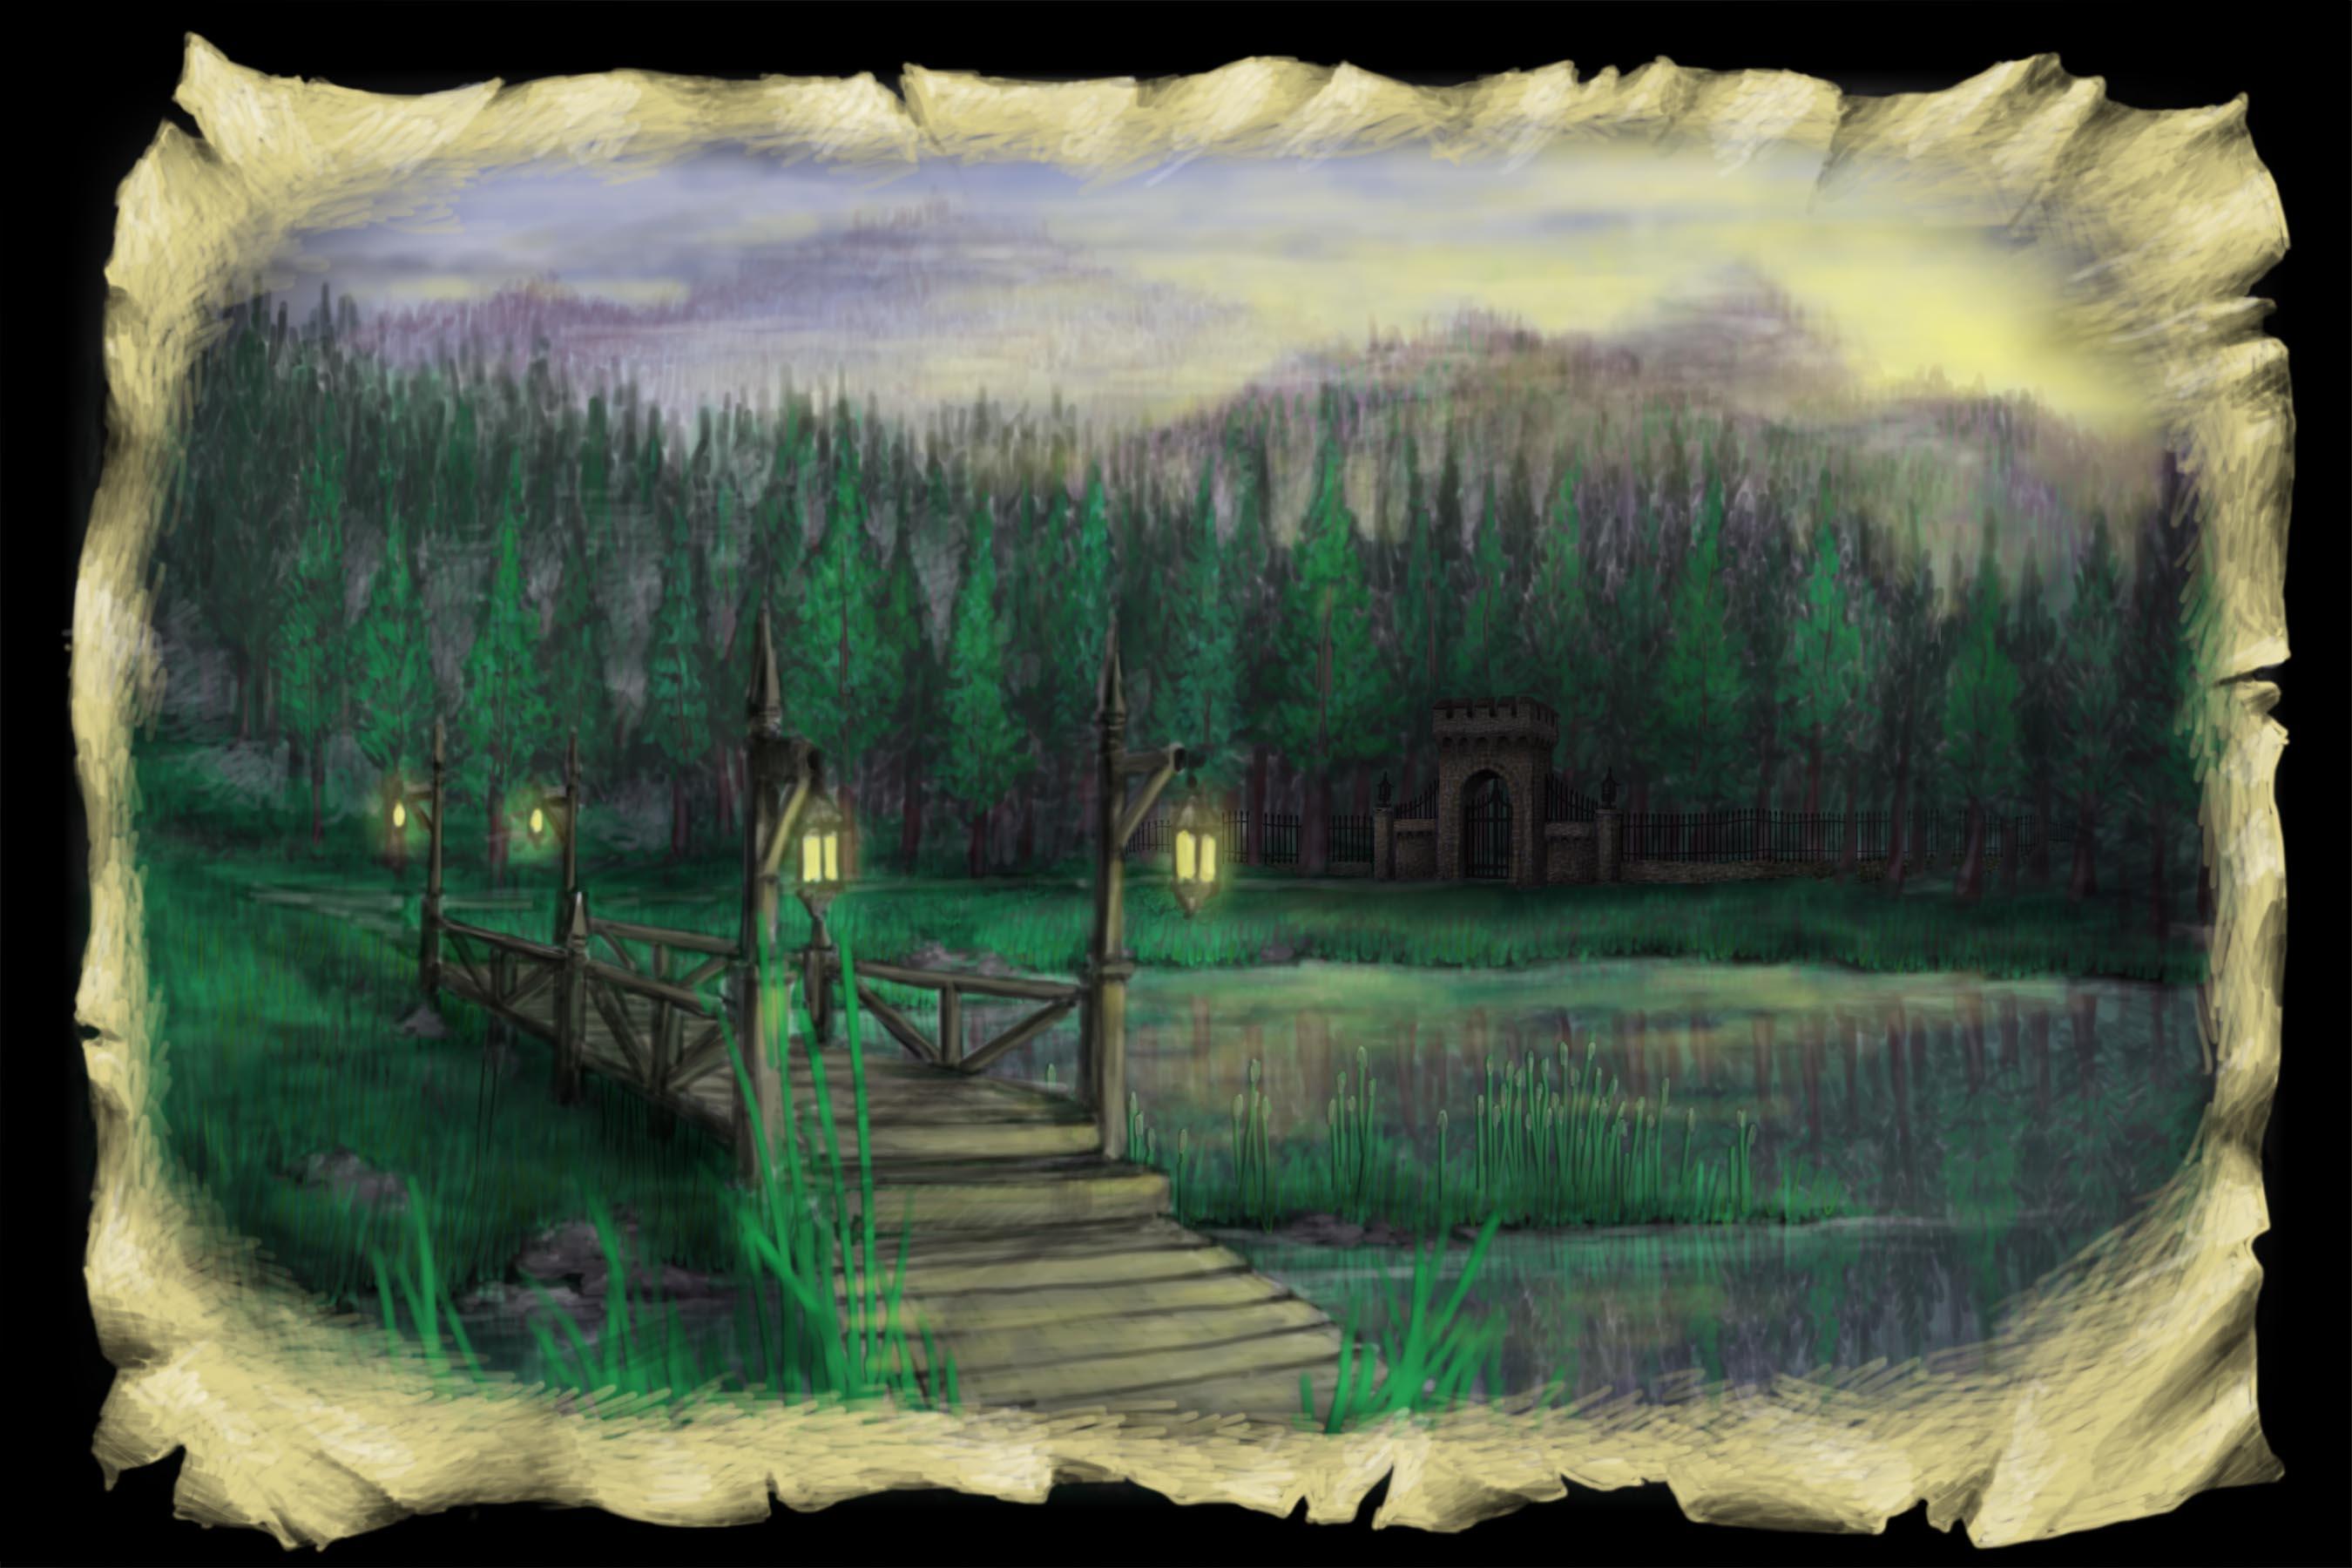 Scene 2a. Lake and Bridge, Pre-Sunrise